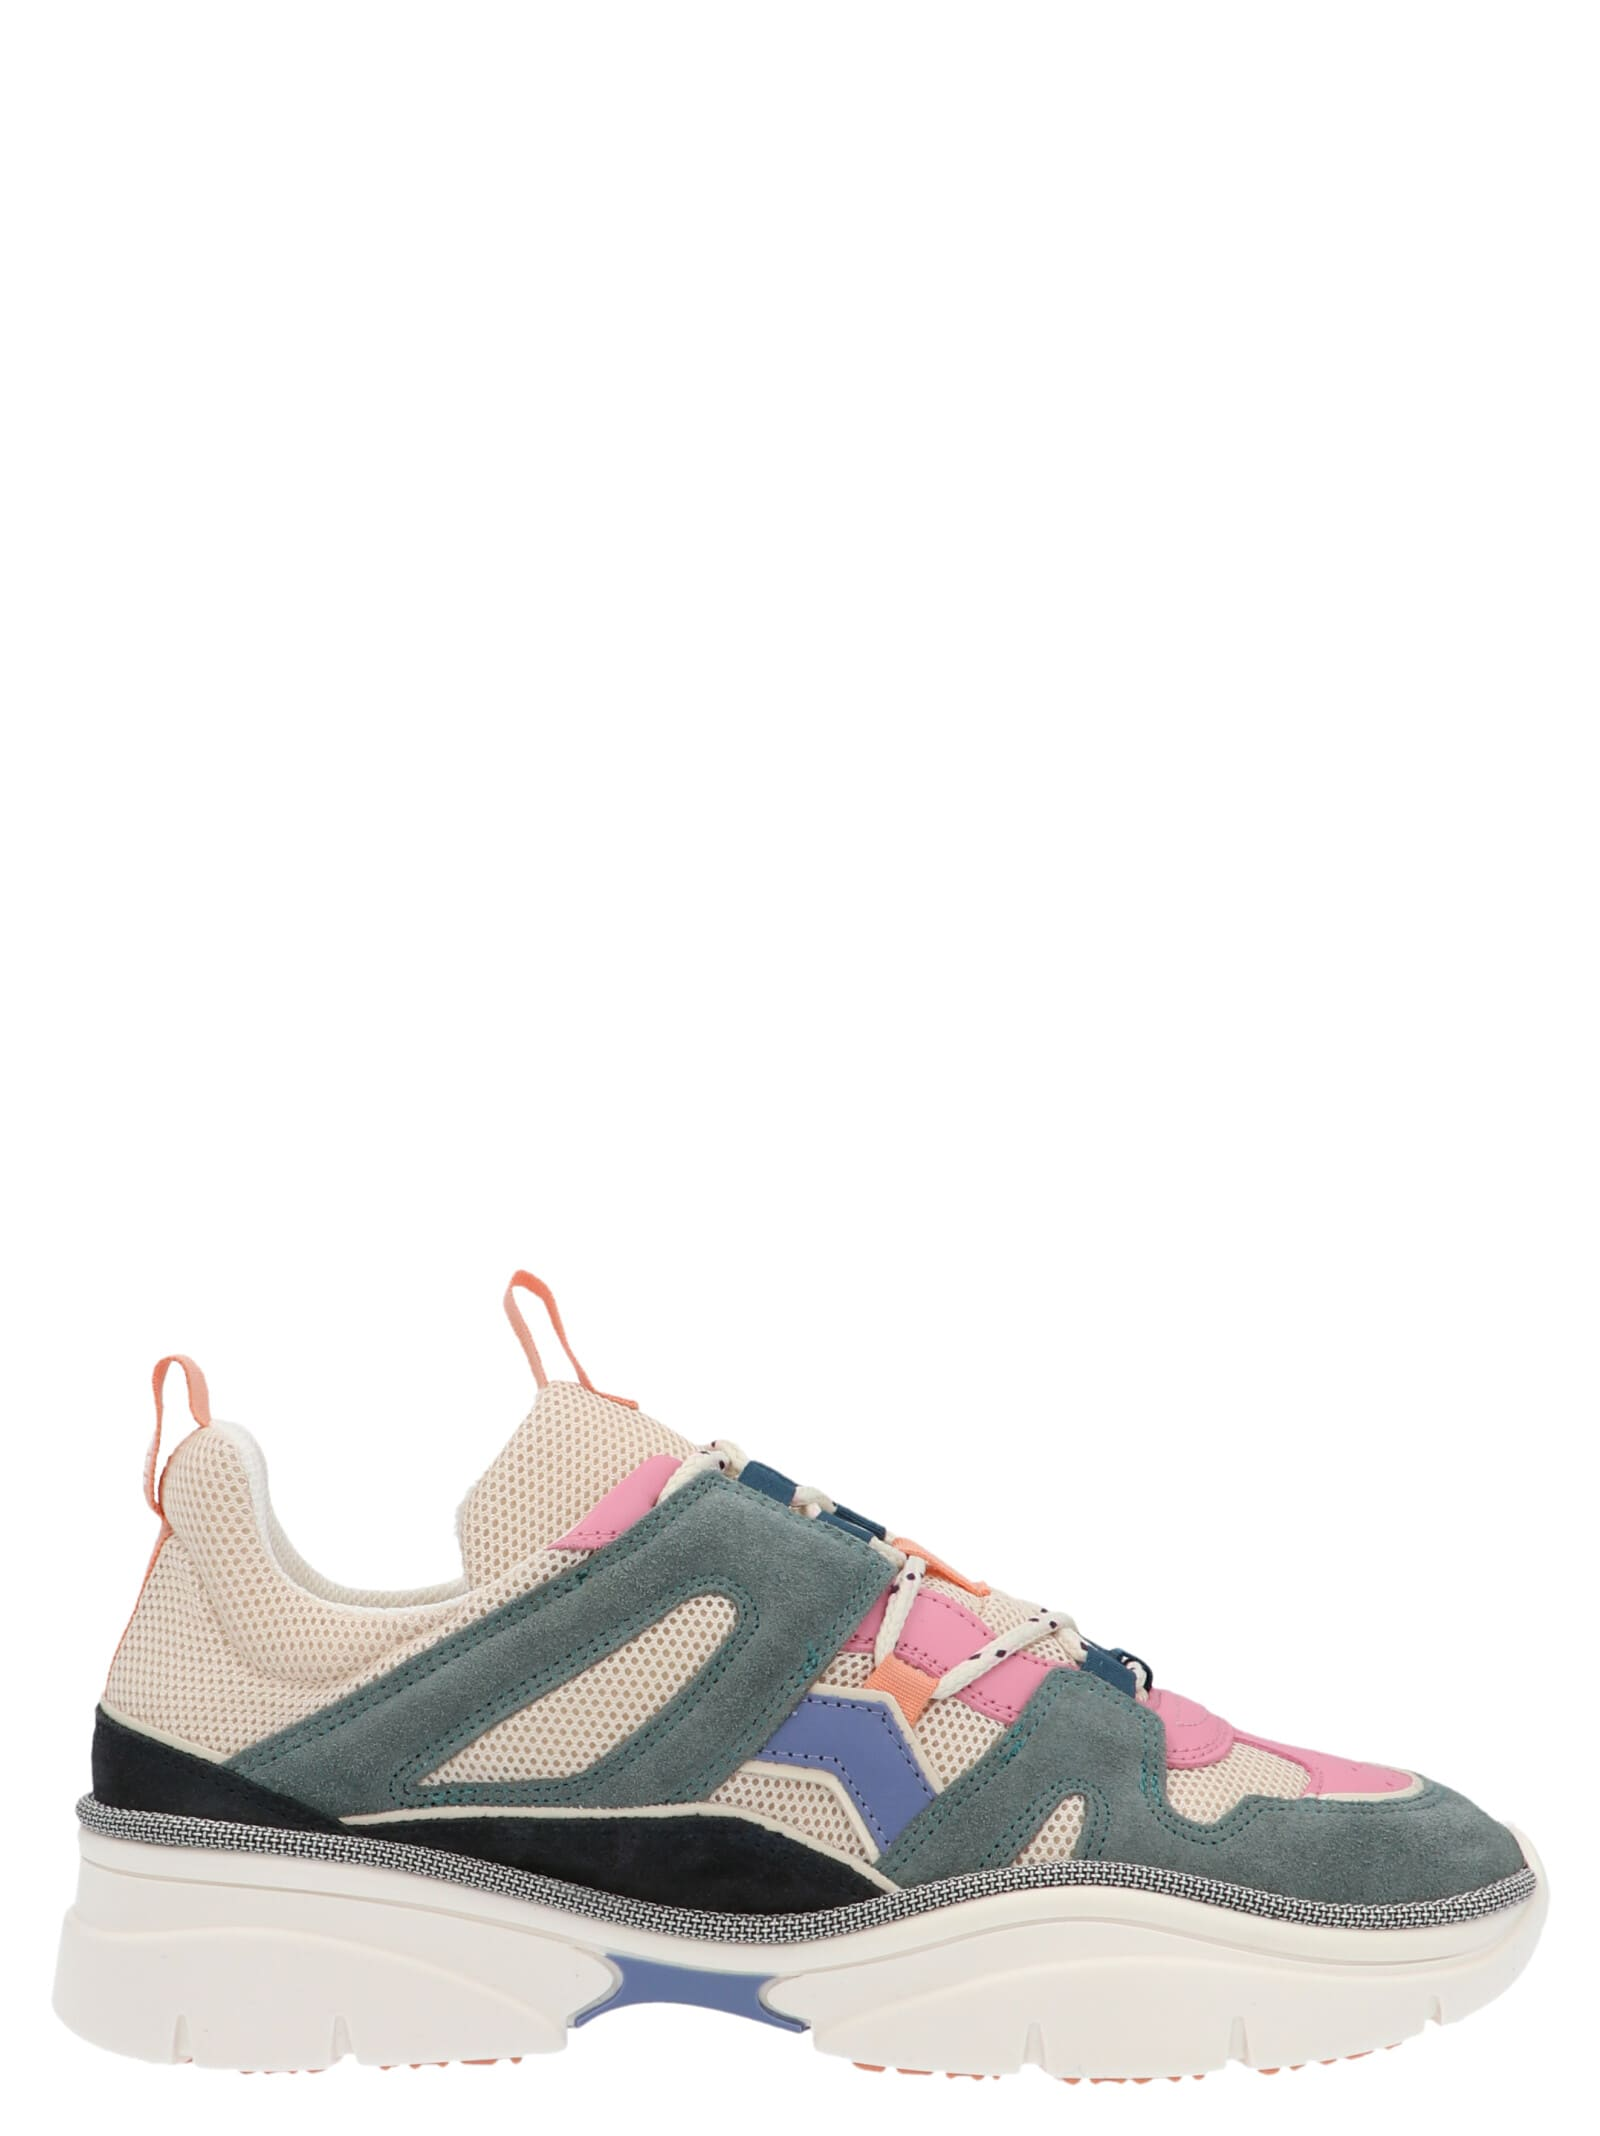 Isabel Marant Sneakers | italist